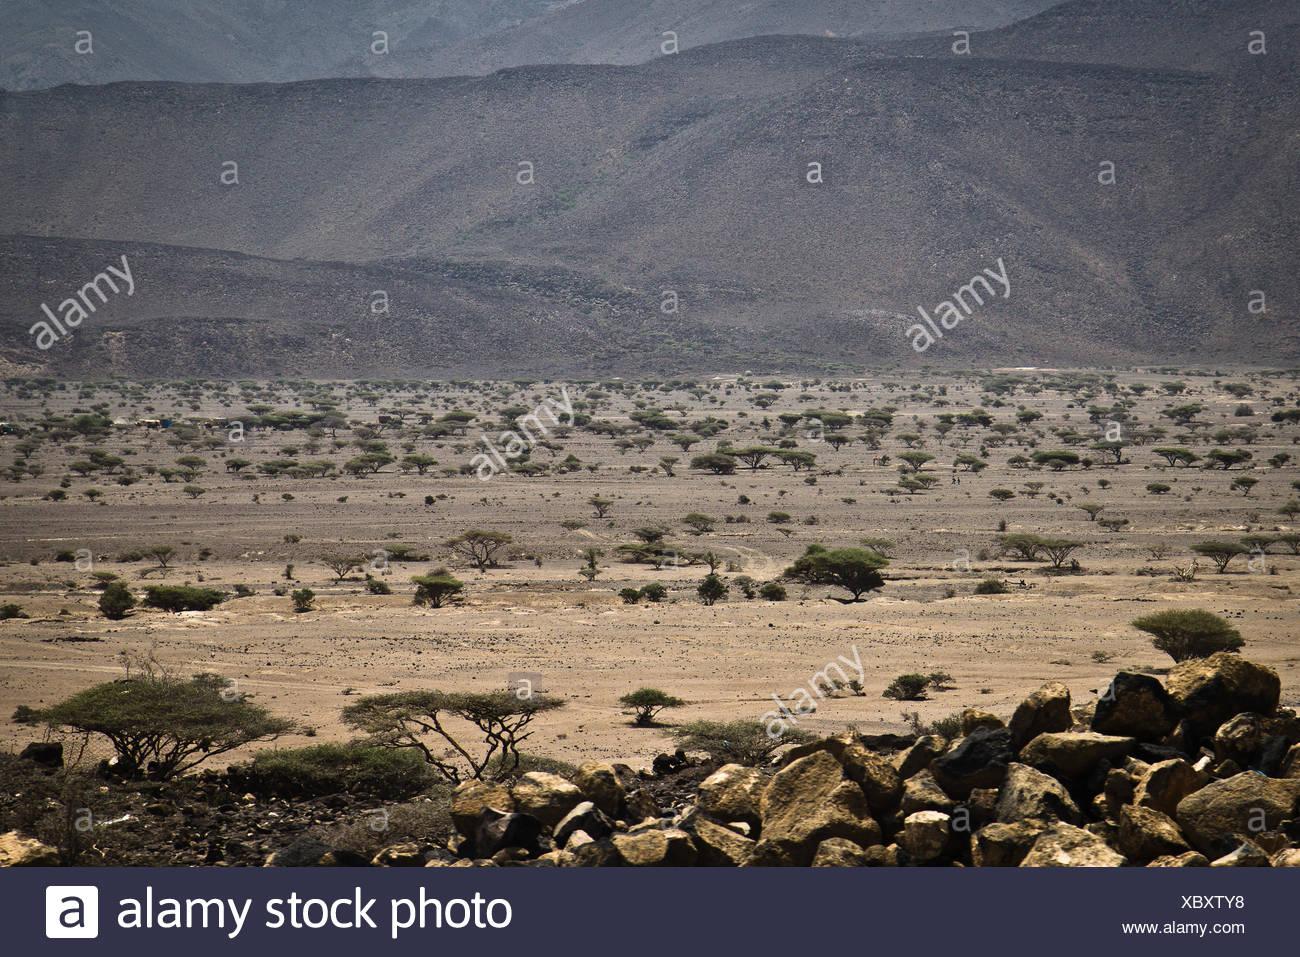 Djibouti landscape - Stock Image